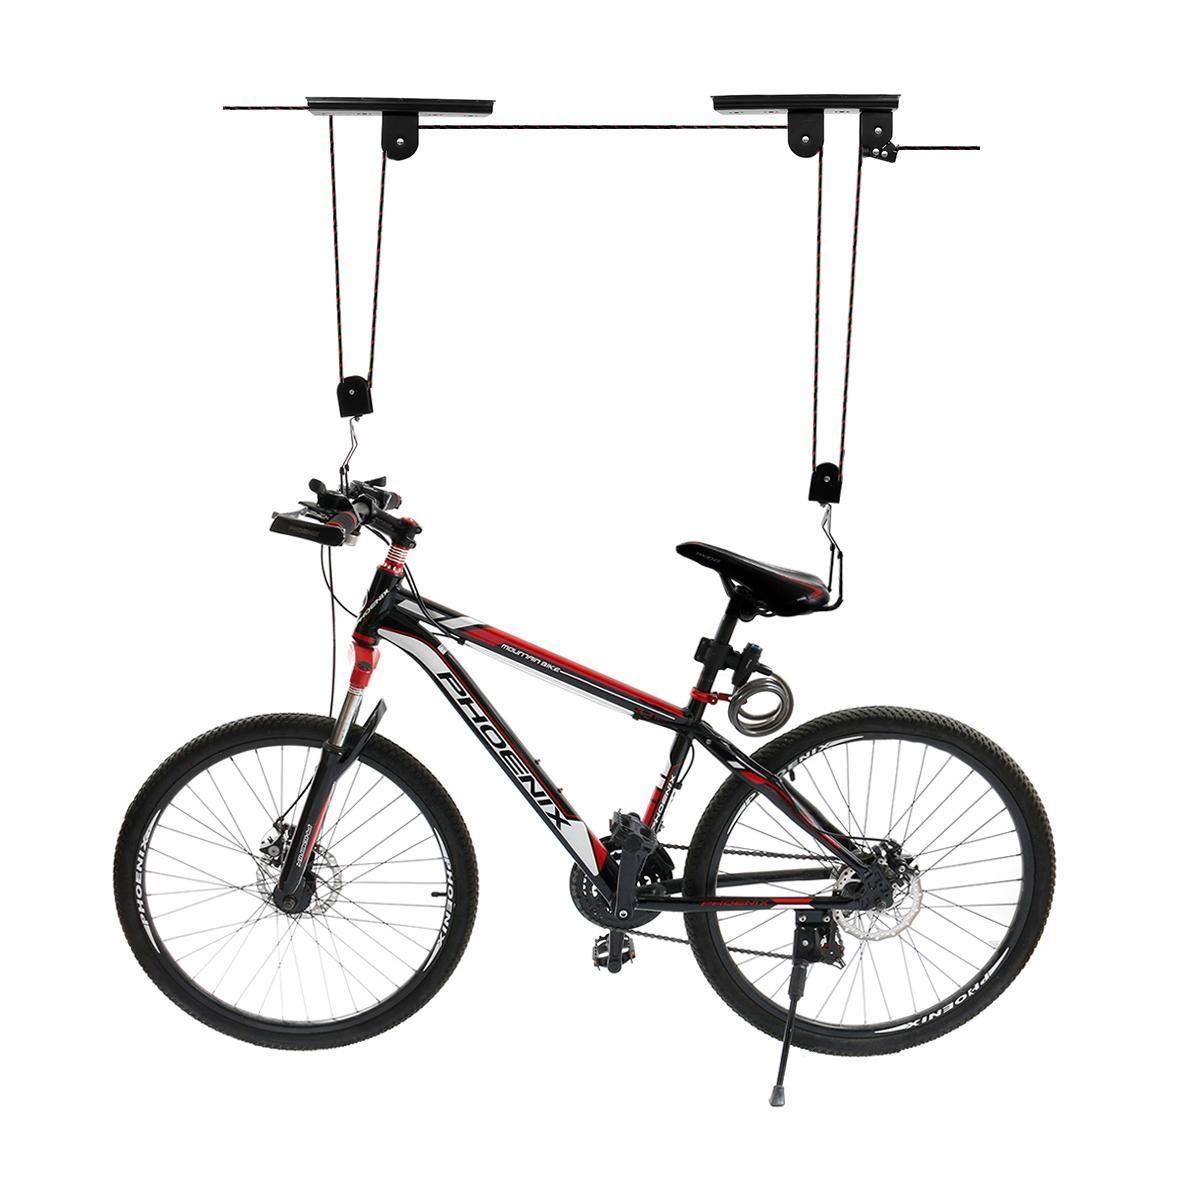 Generic Kayak Hoist Bike Lift Pulley System Ceiling Hook Garage